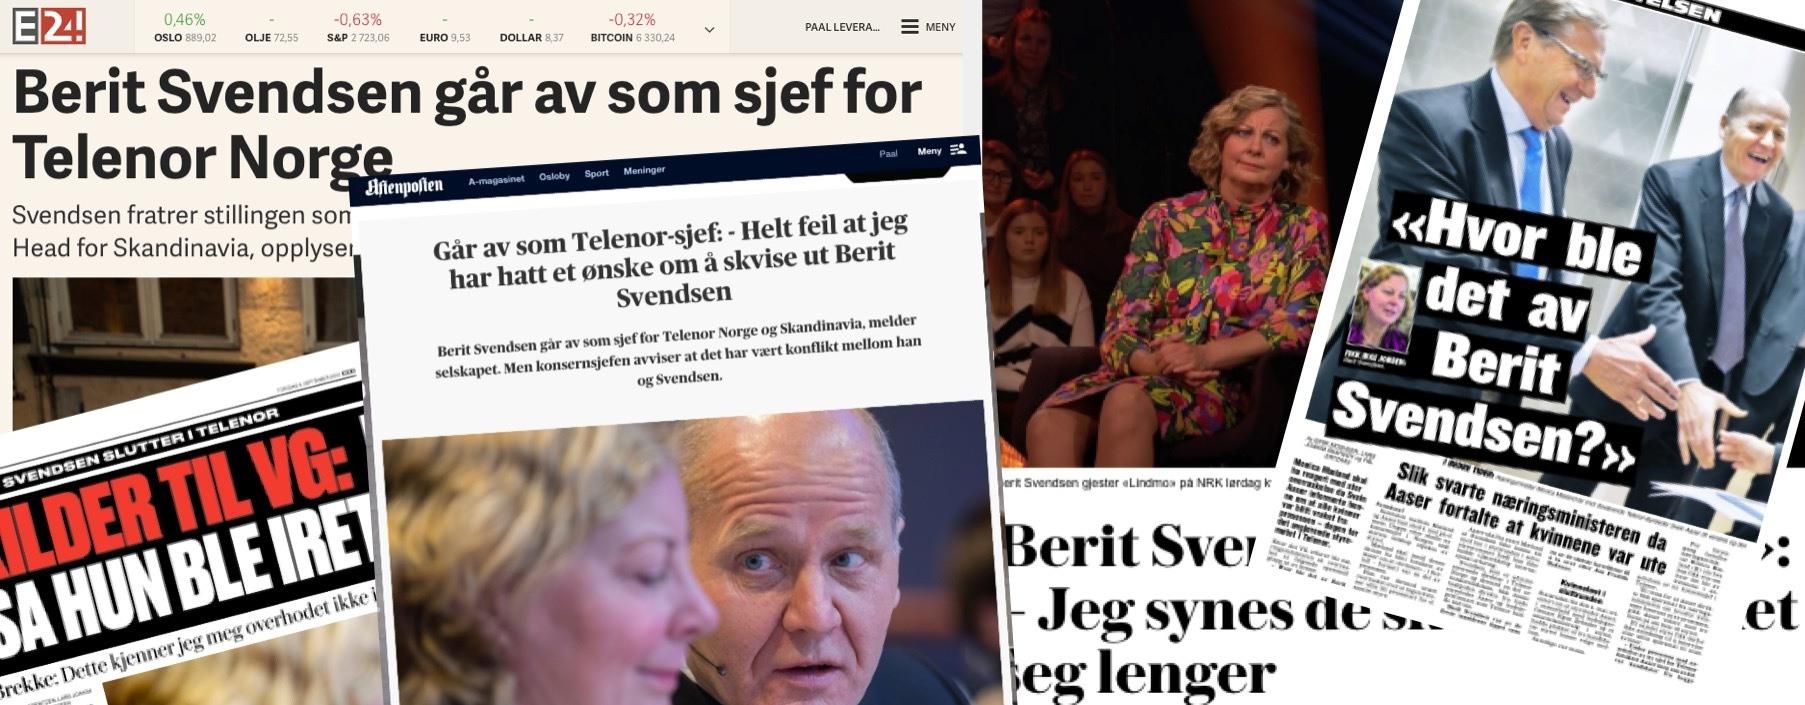 Overskrifter Berit Svendsen